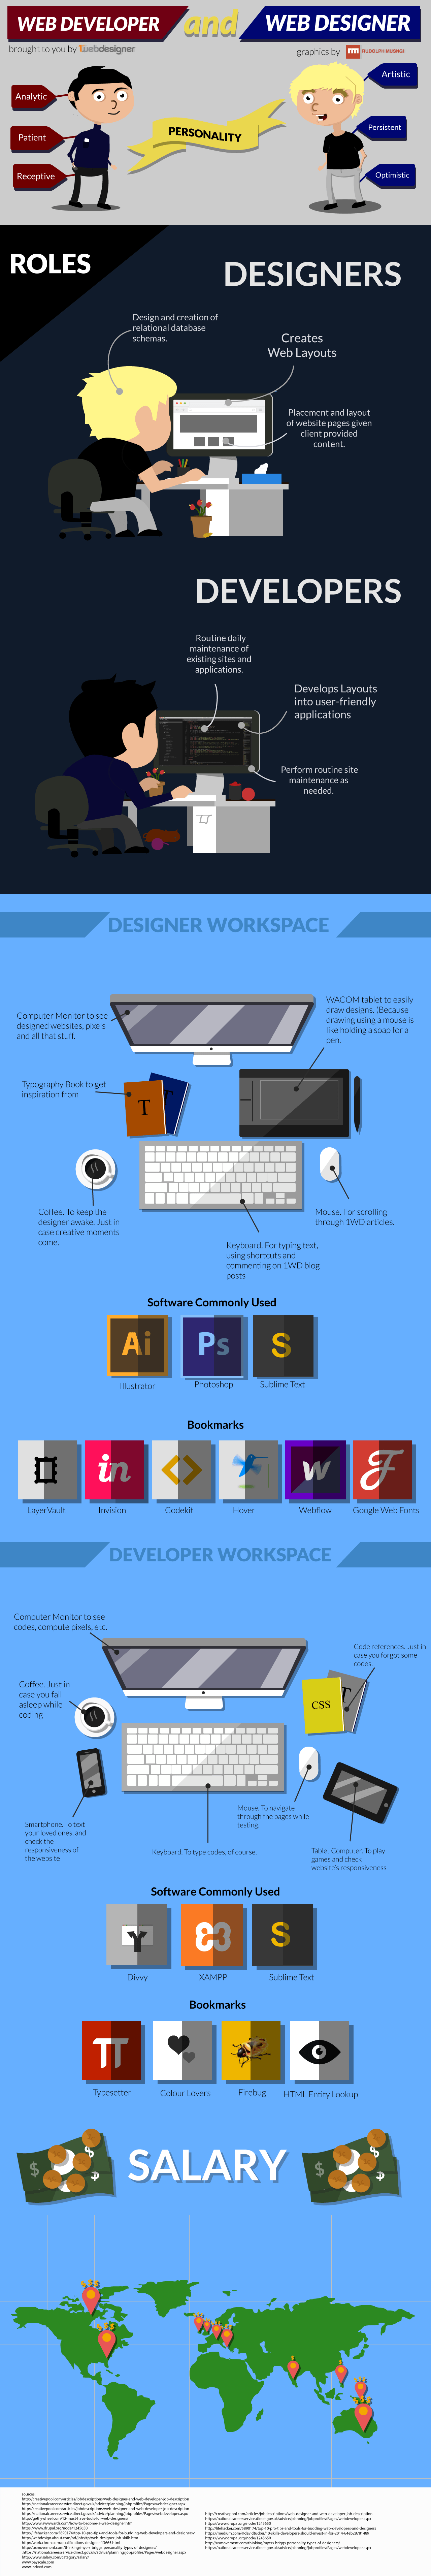 webdesignvsdevt